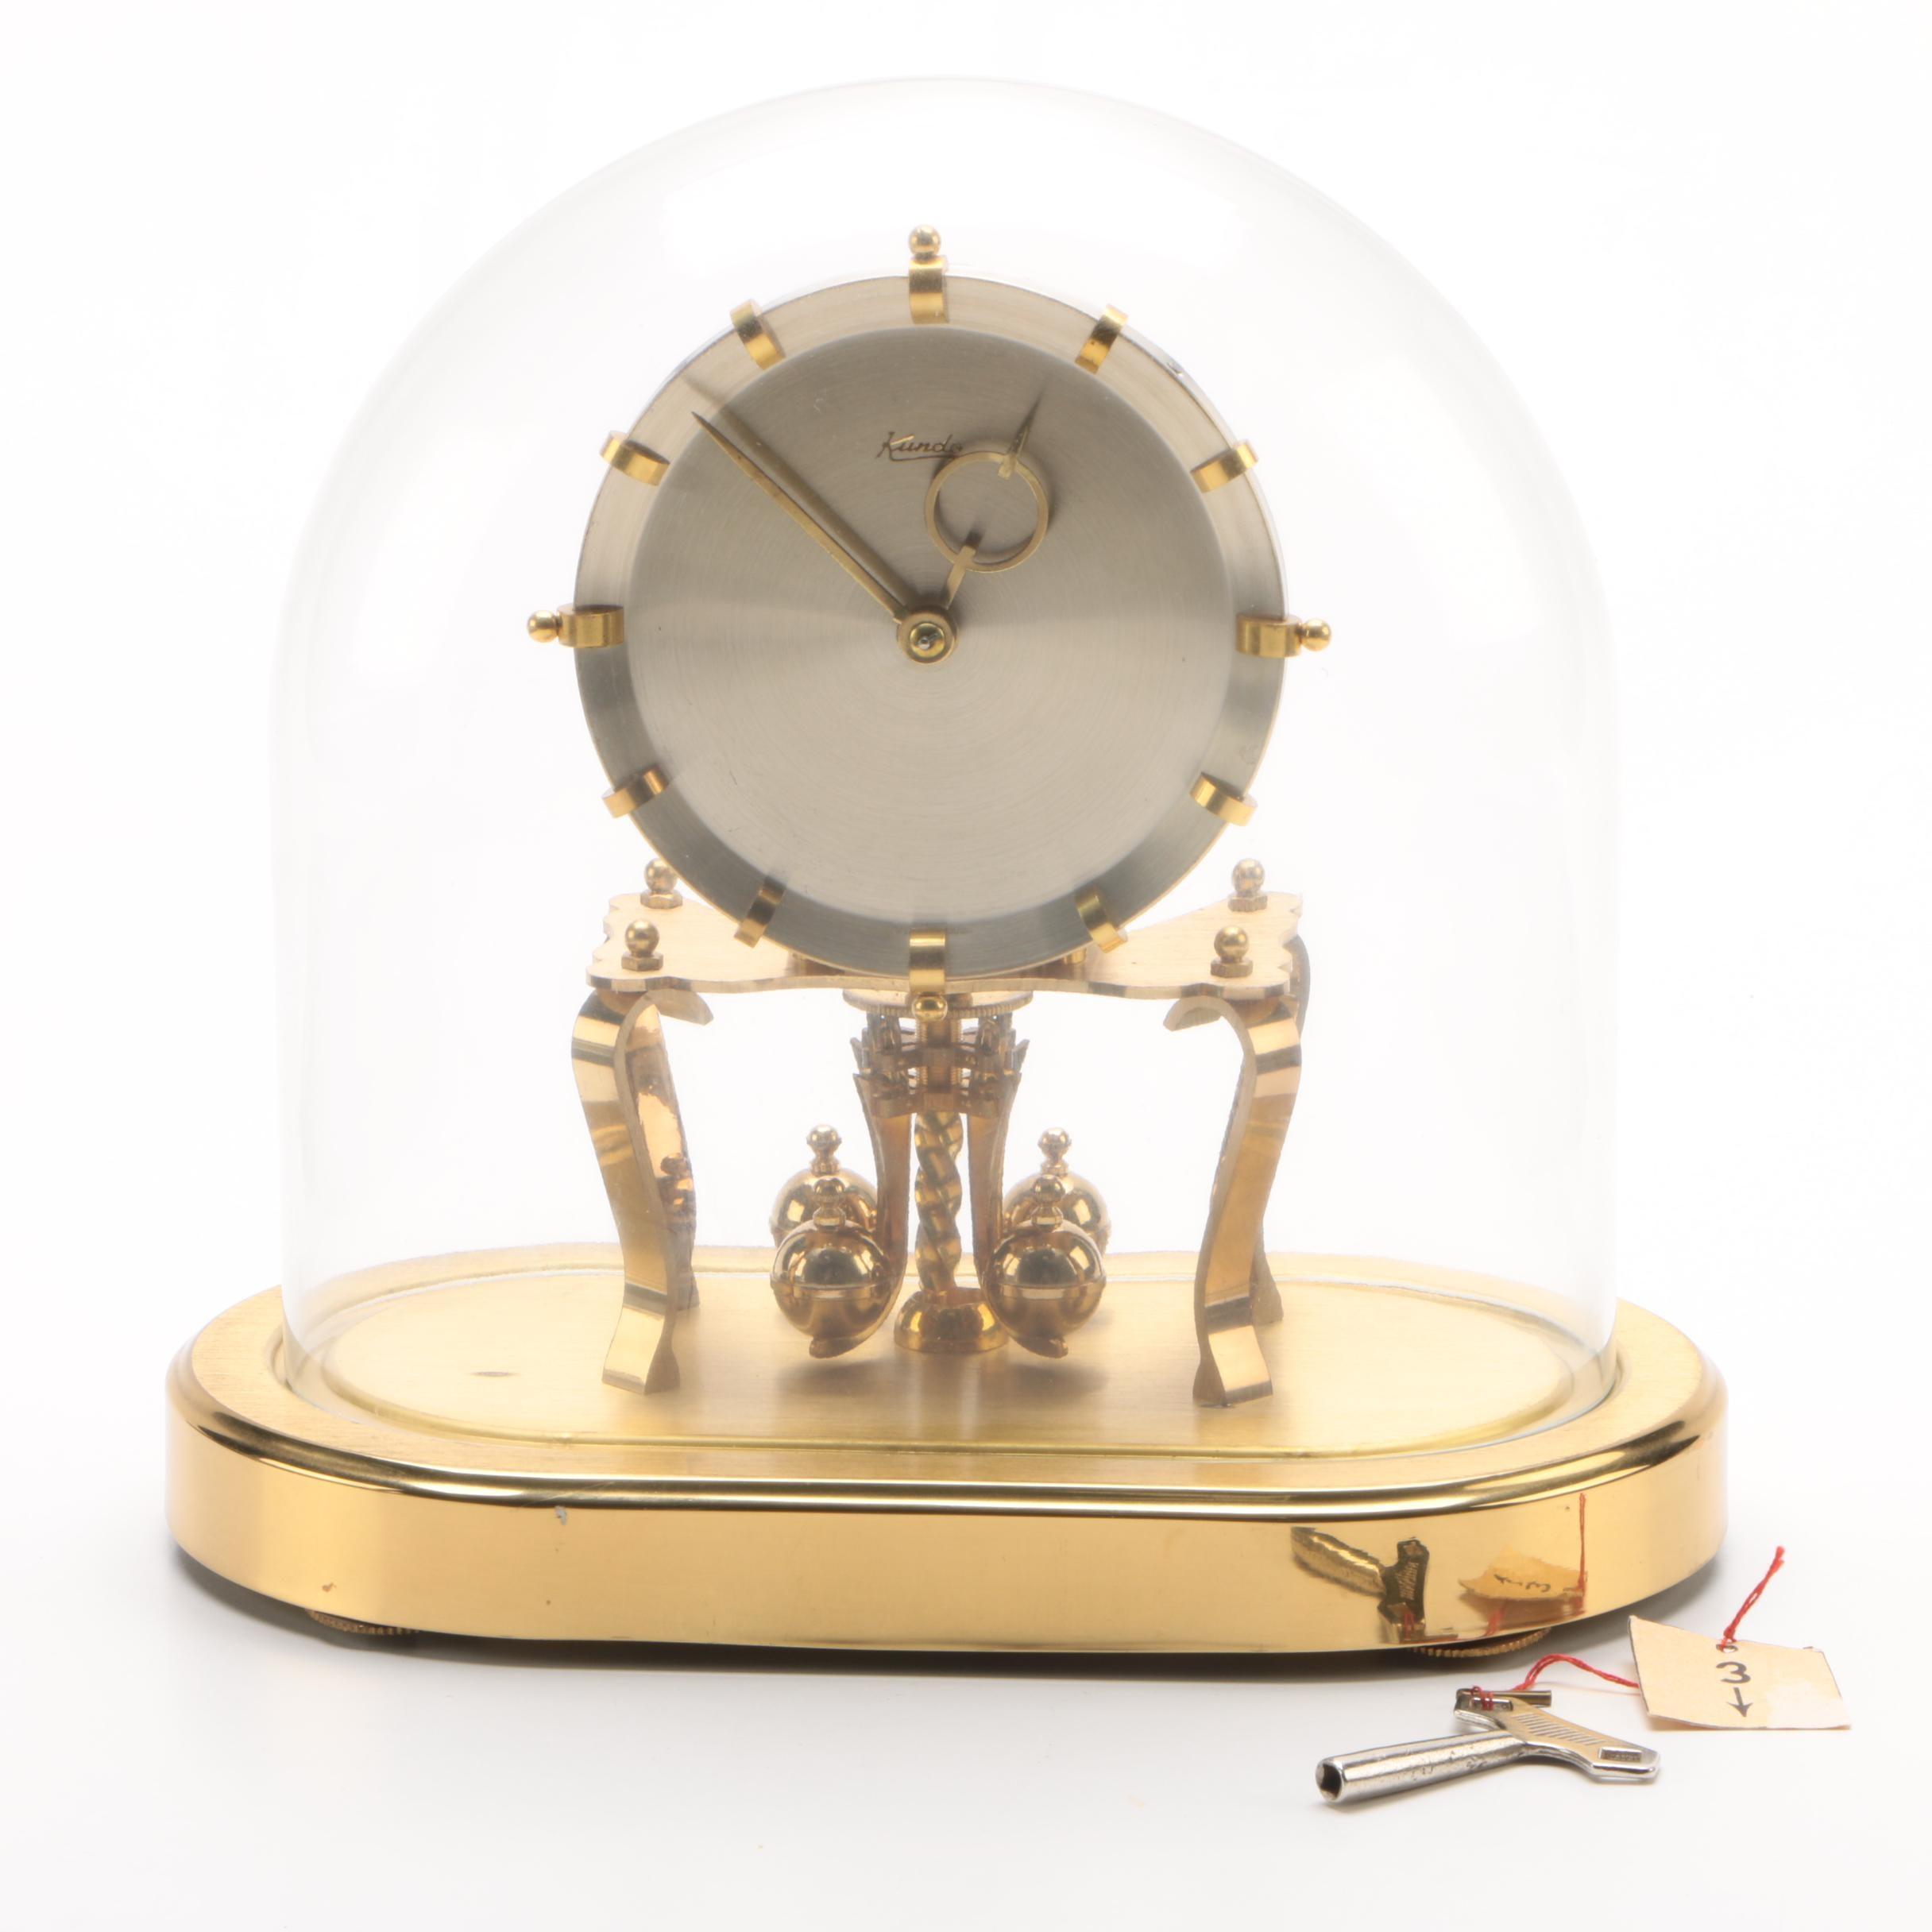 German Kundo Kieninger & Obergfell Anniversary Clock